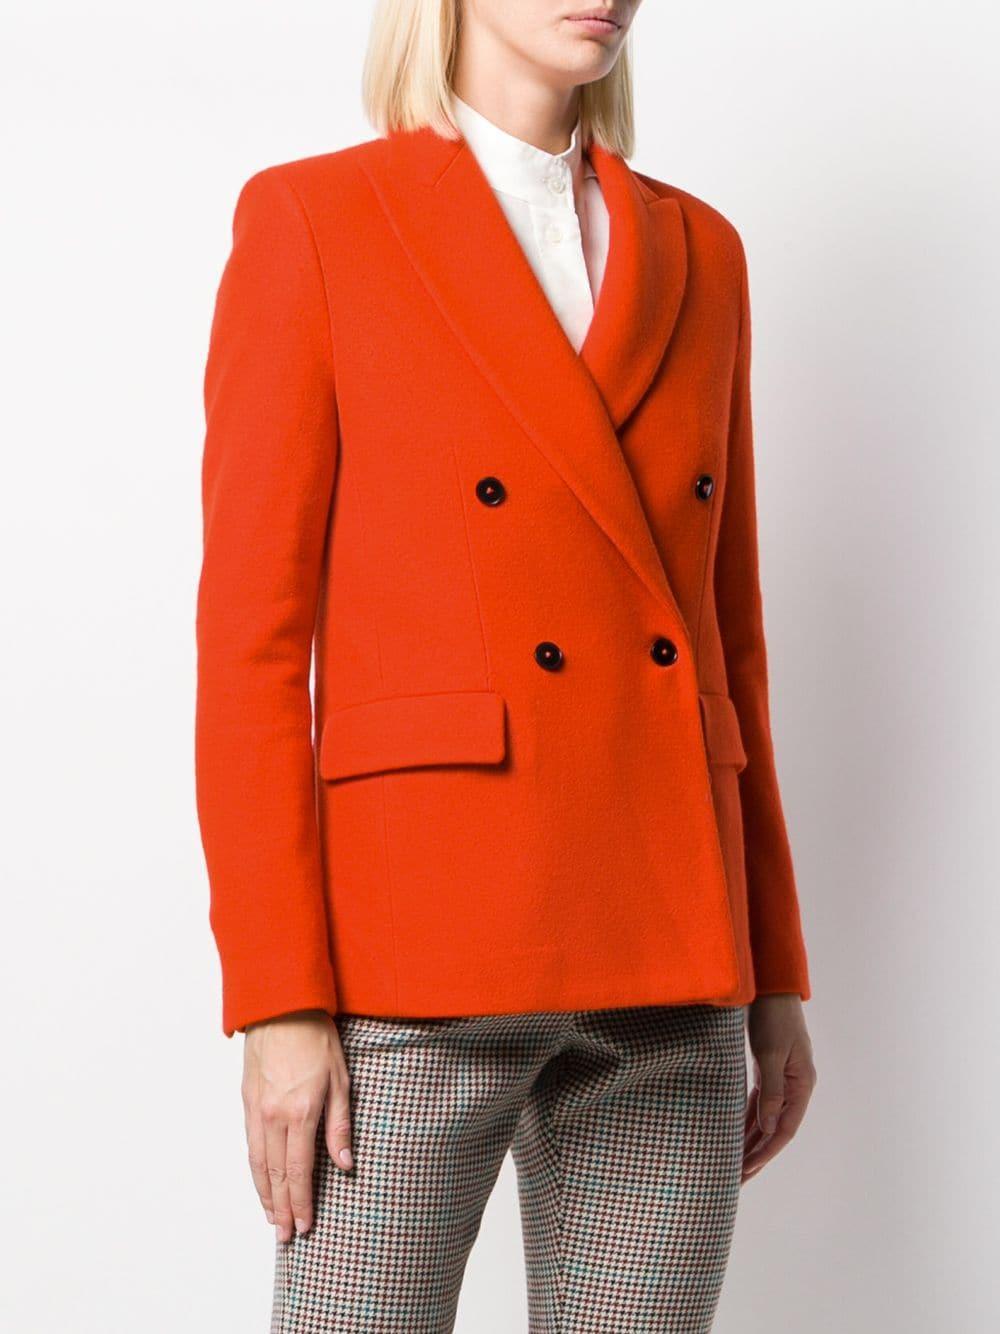 Blazer Cleope Laines Barena en coloris Orange